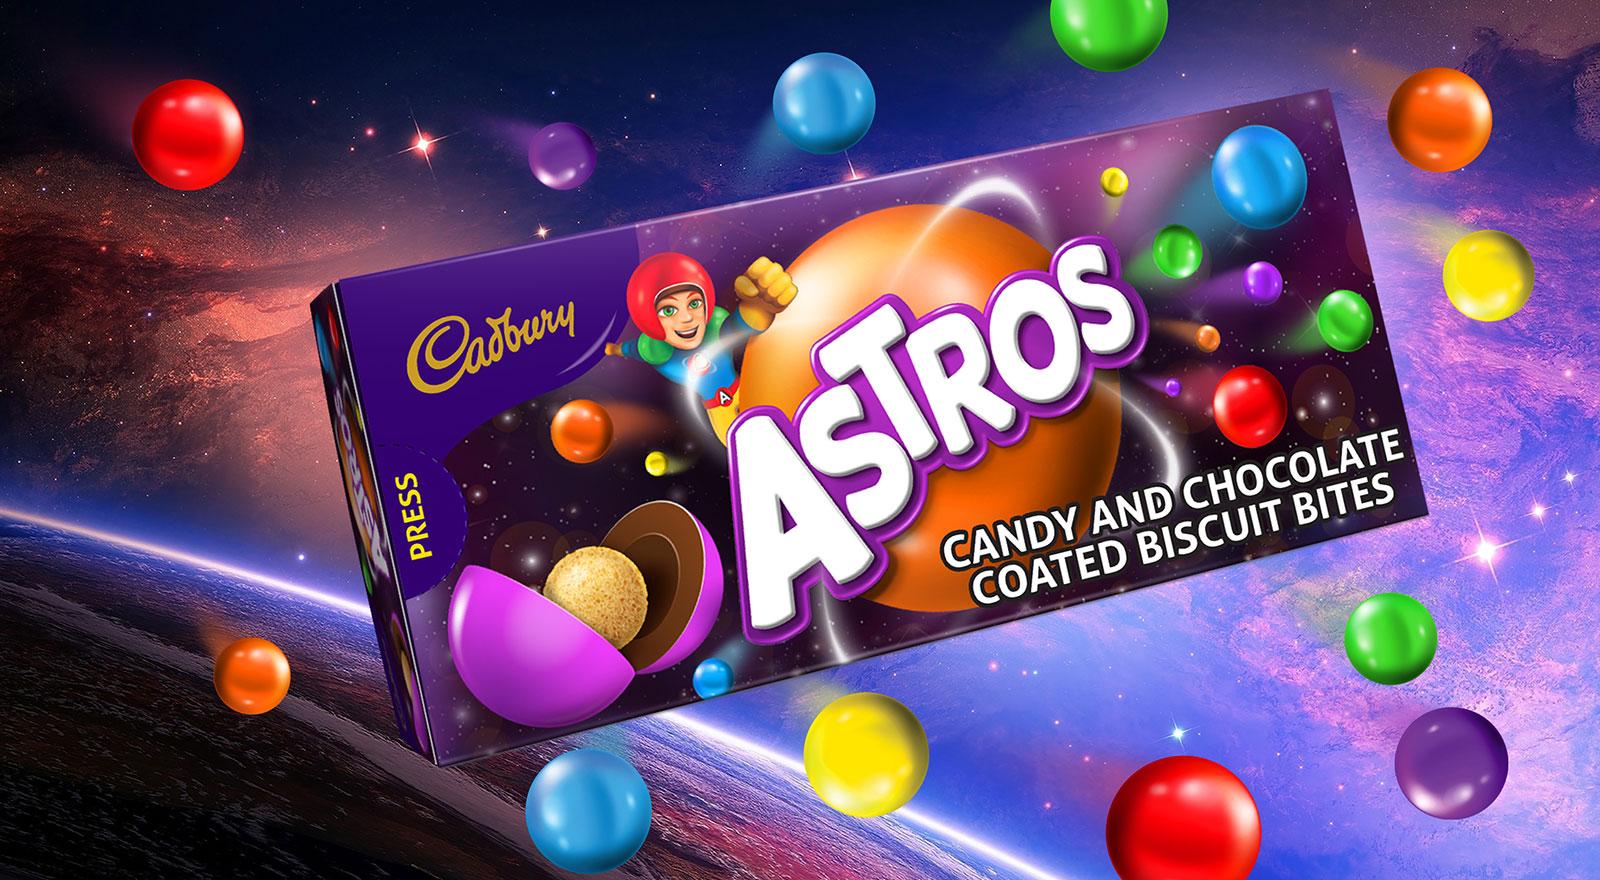 Astros_banner_5